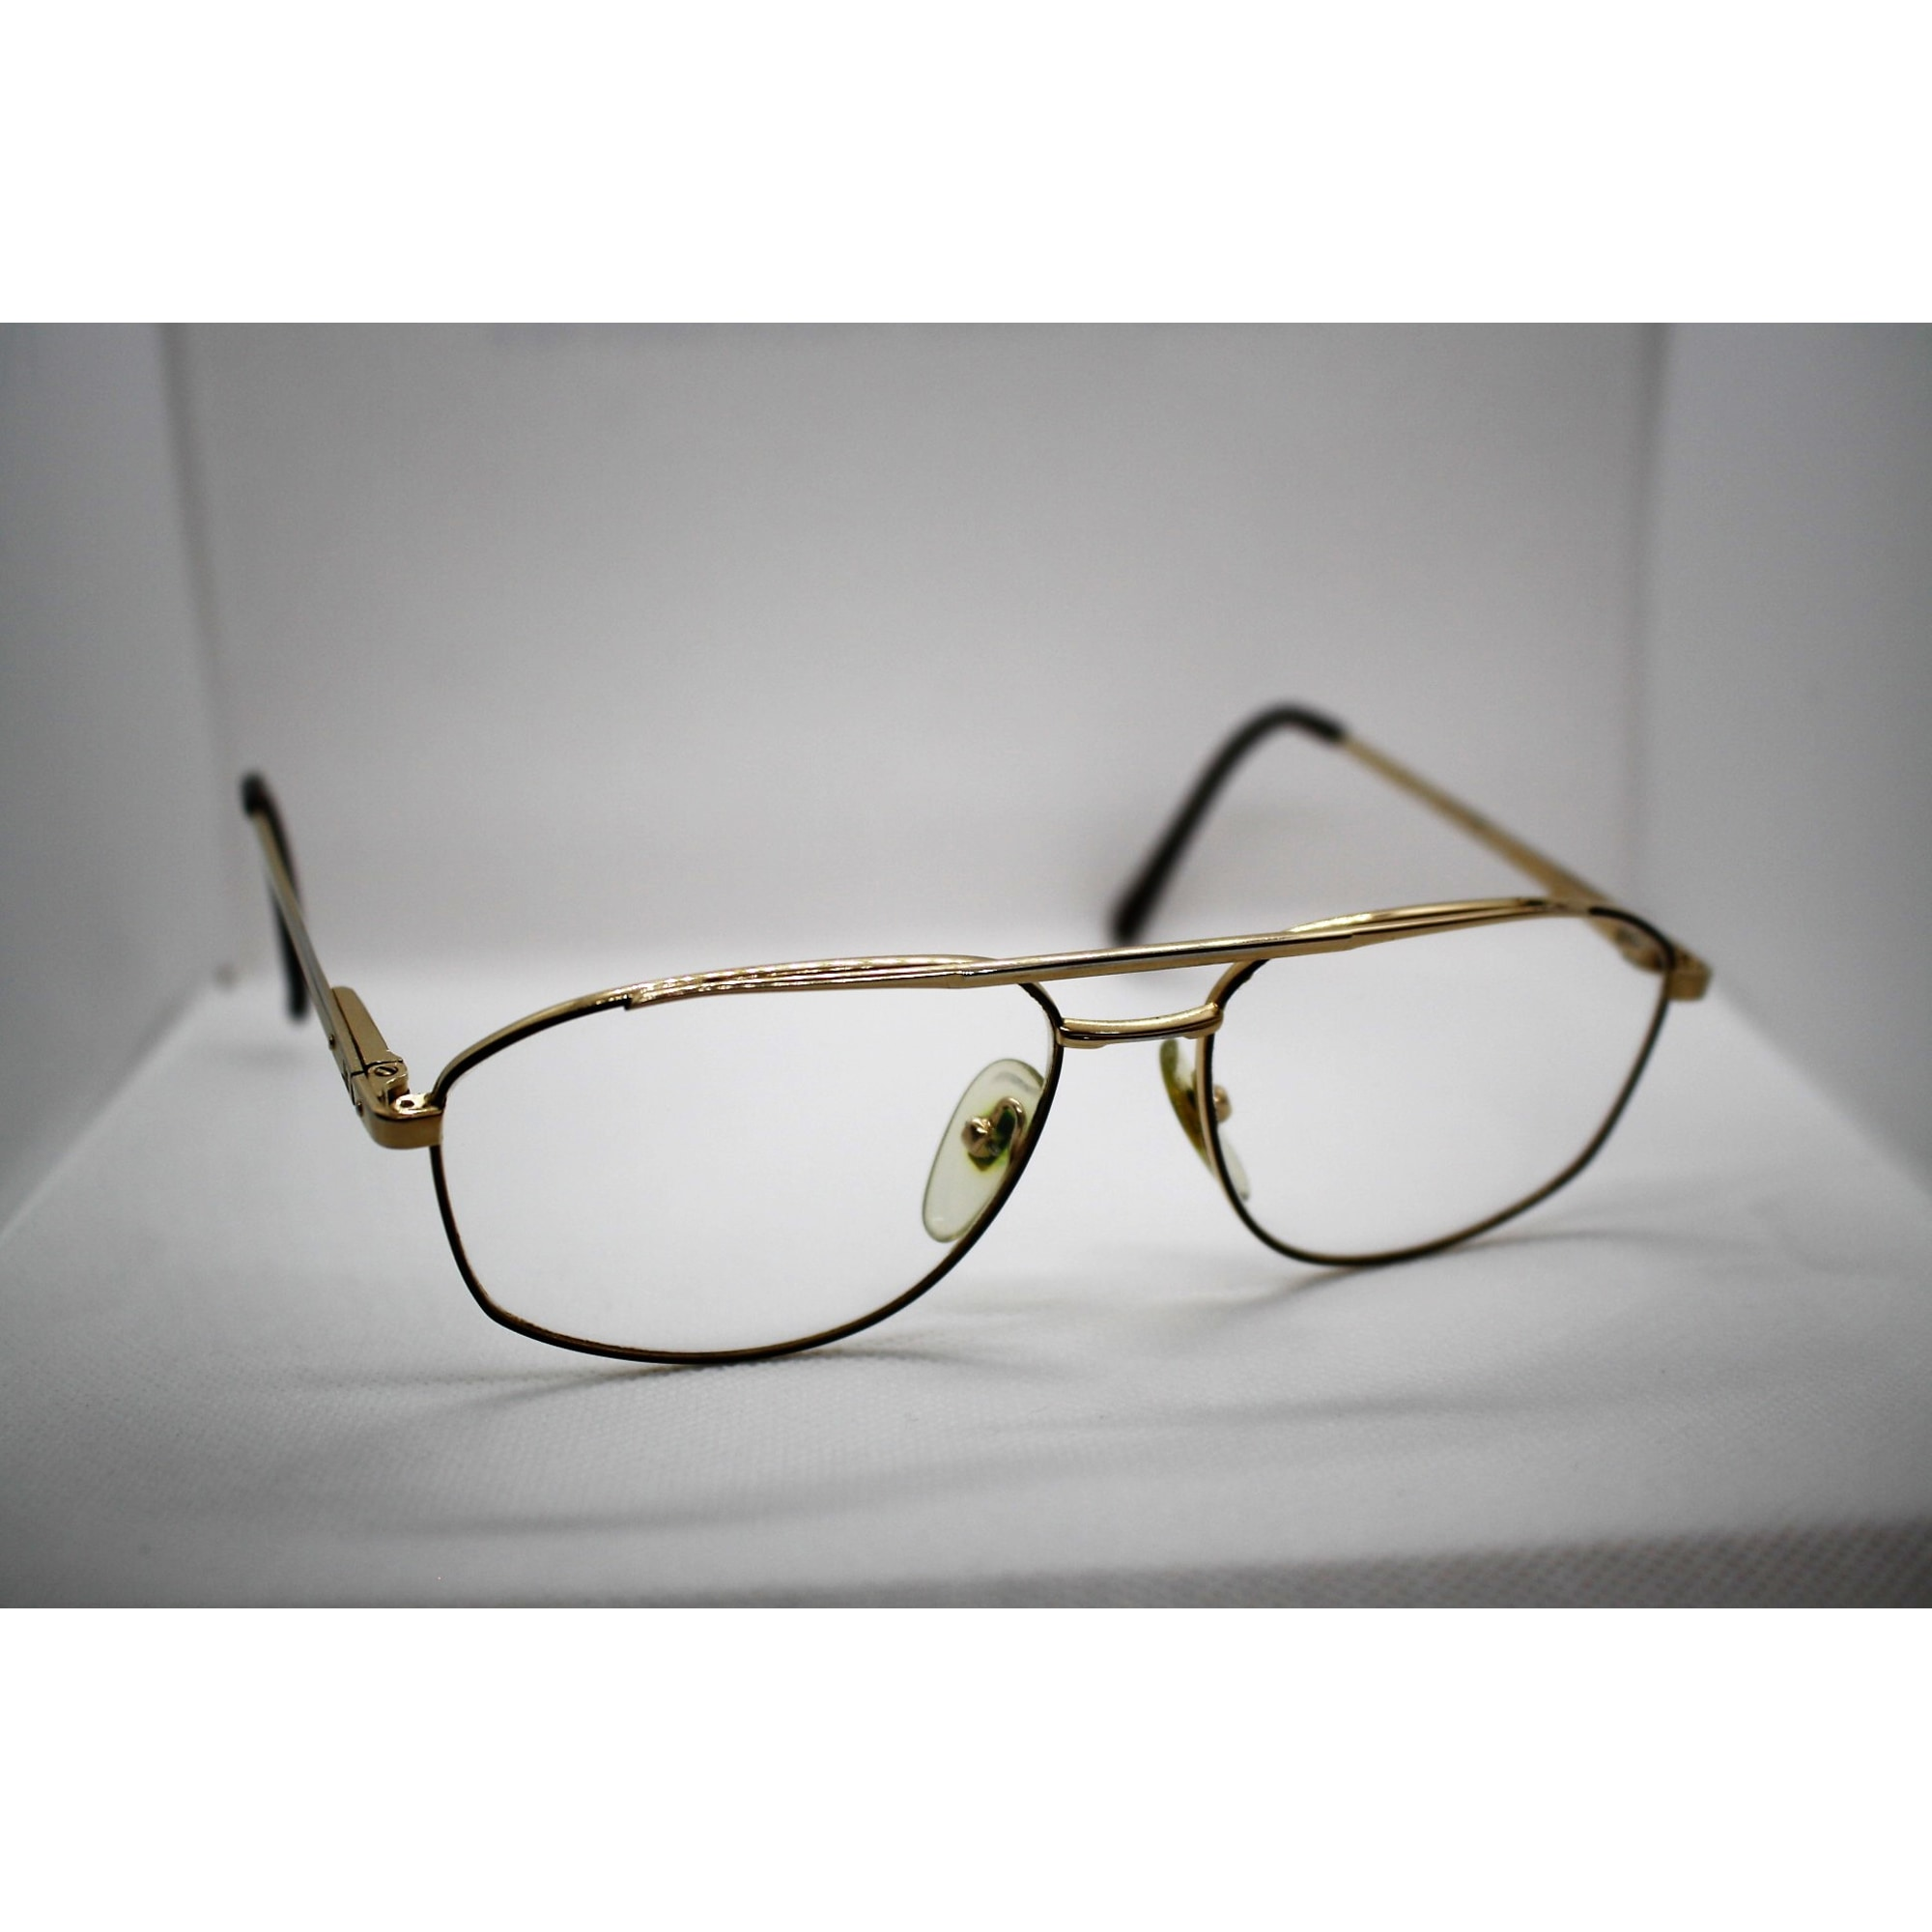 Eyeglass Frames JEAN LOUIS SCHERRER Golden, bronze, copper